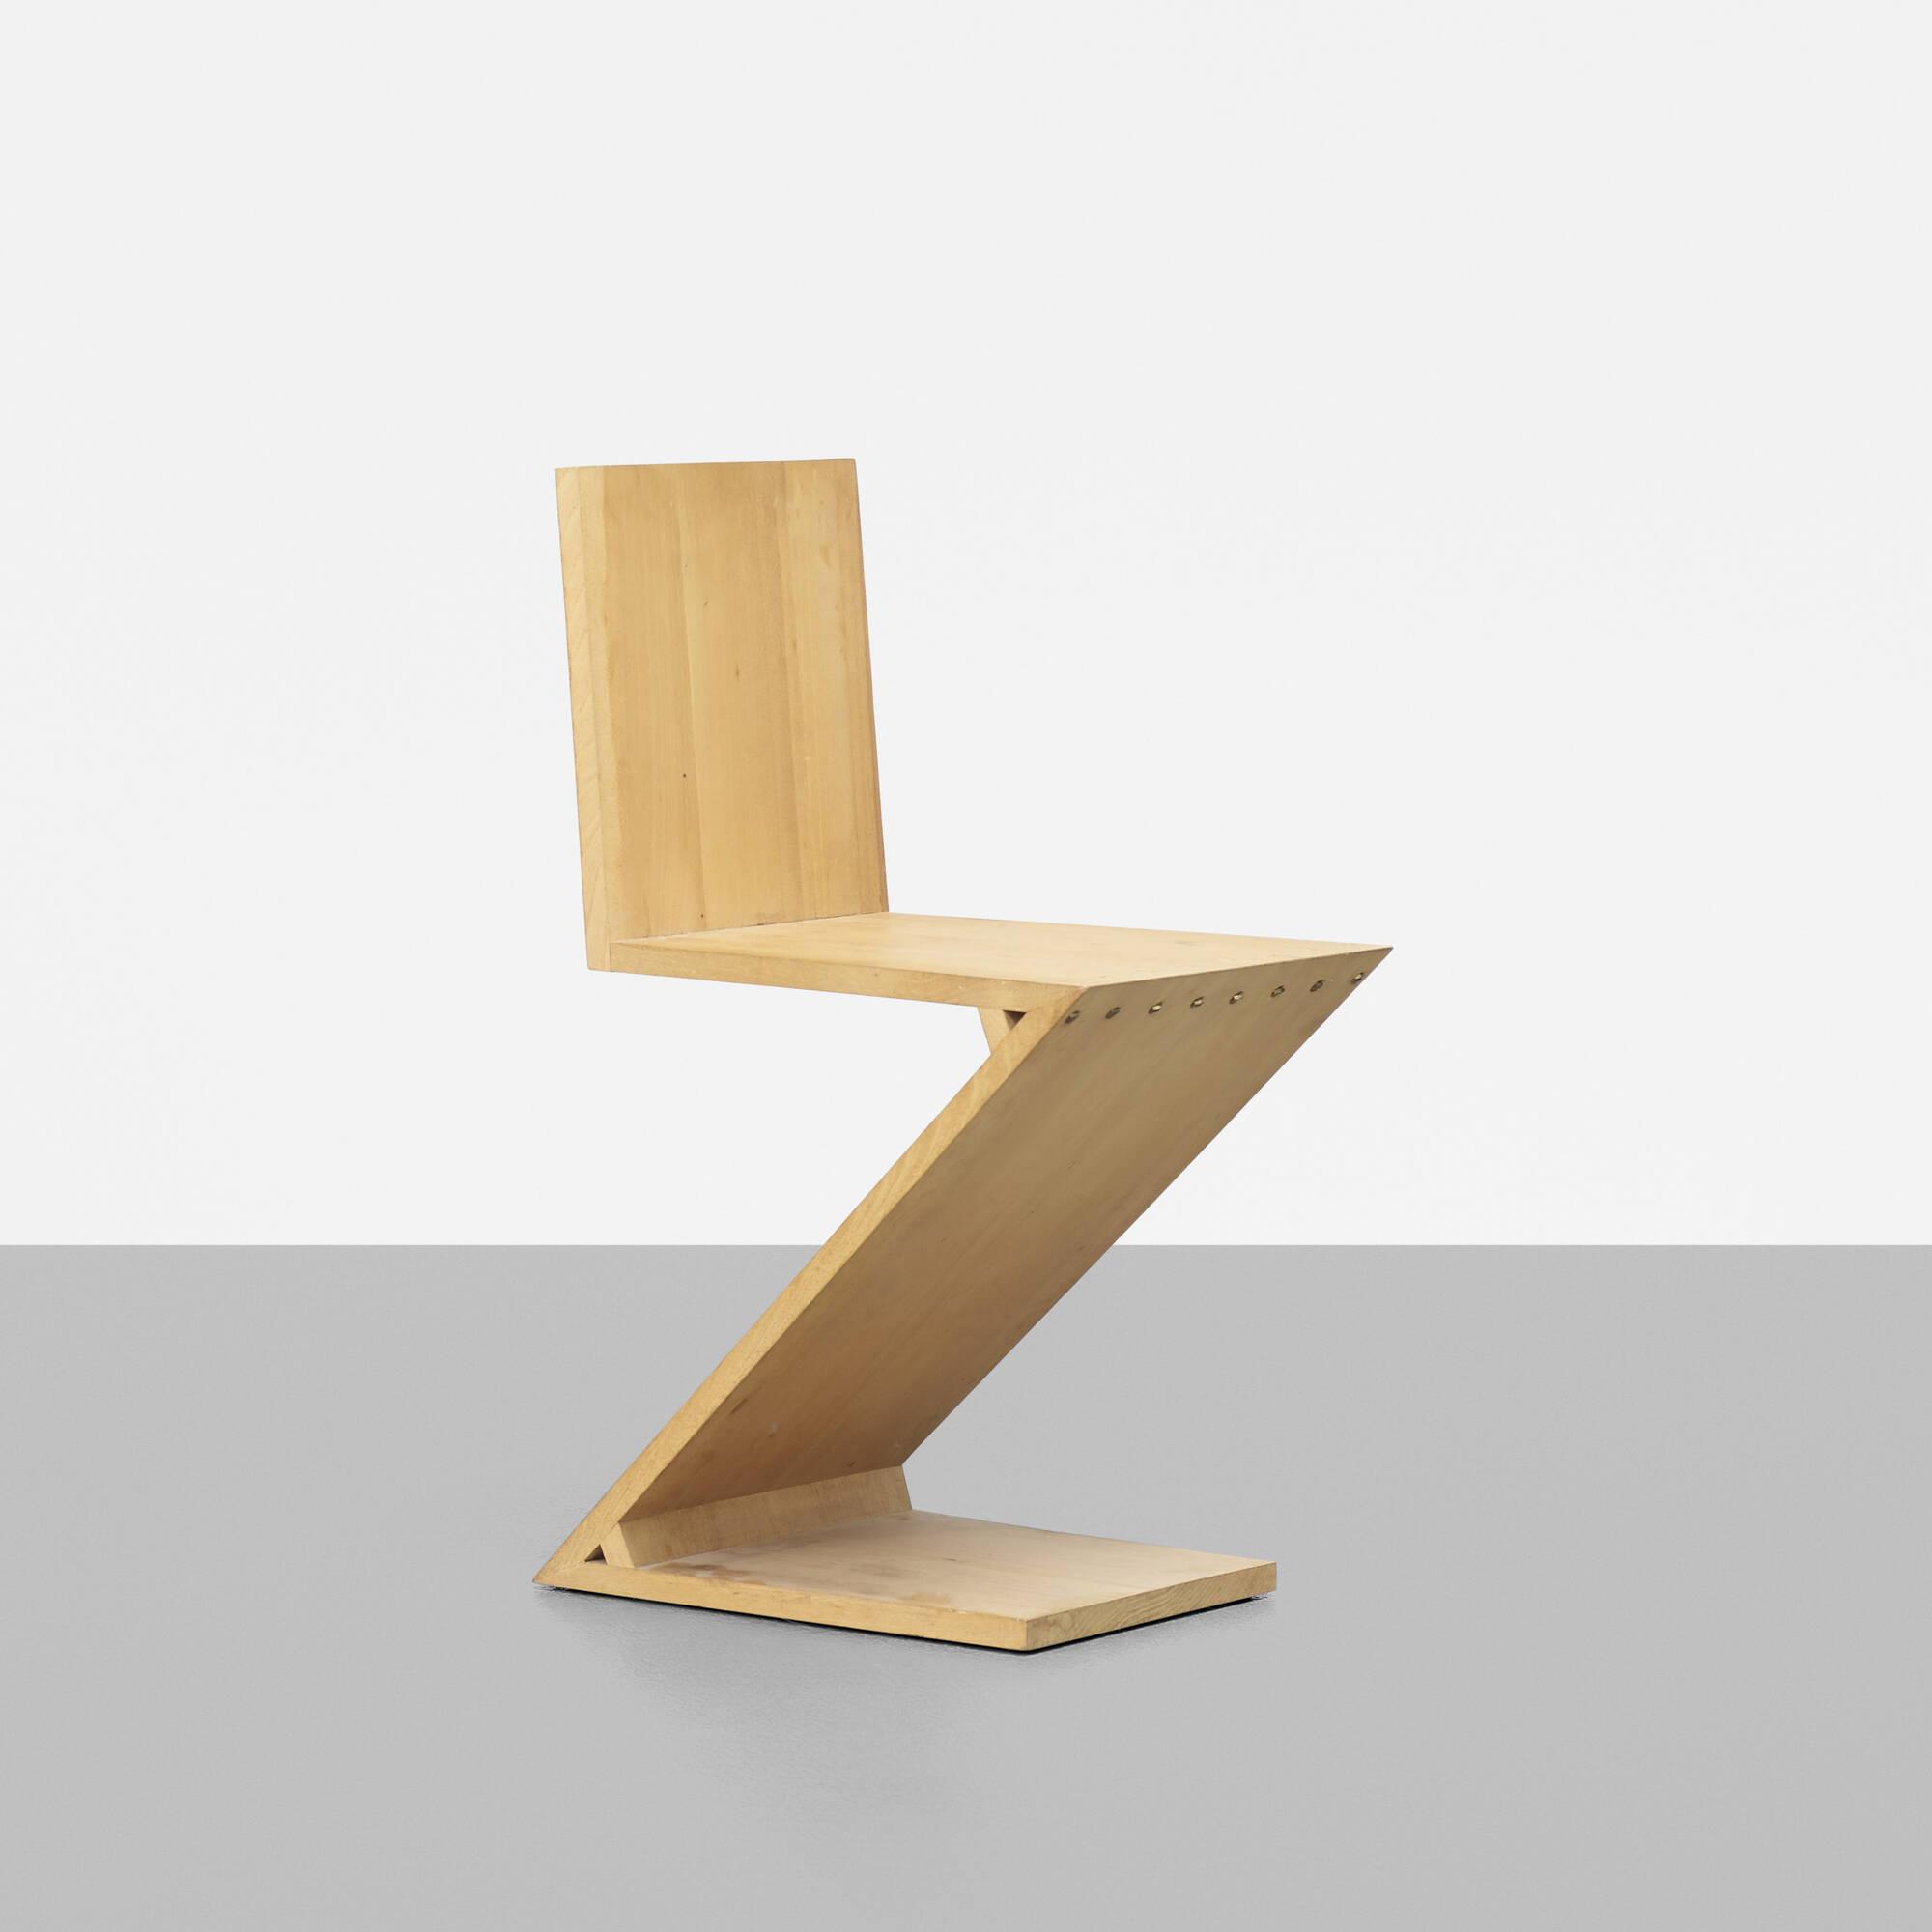 188 gerrit rietveld zig zag chair for Design stuhl zig zag